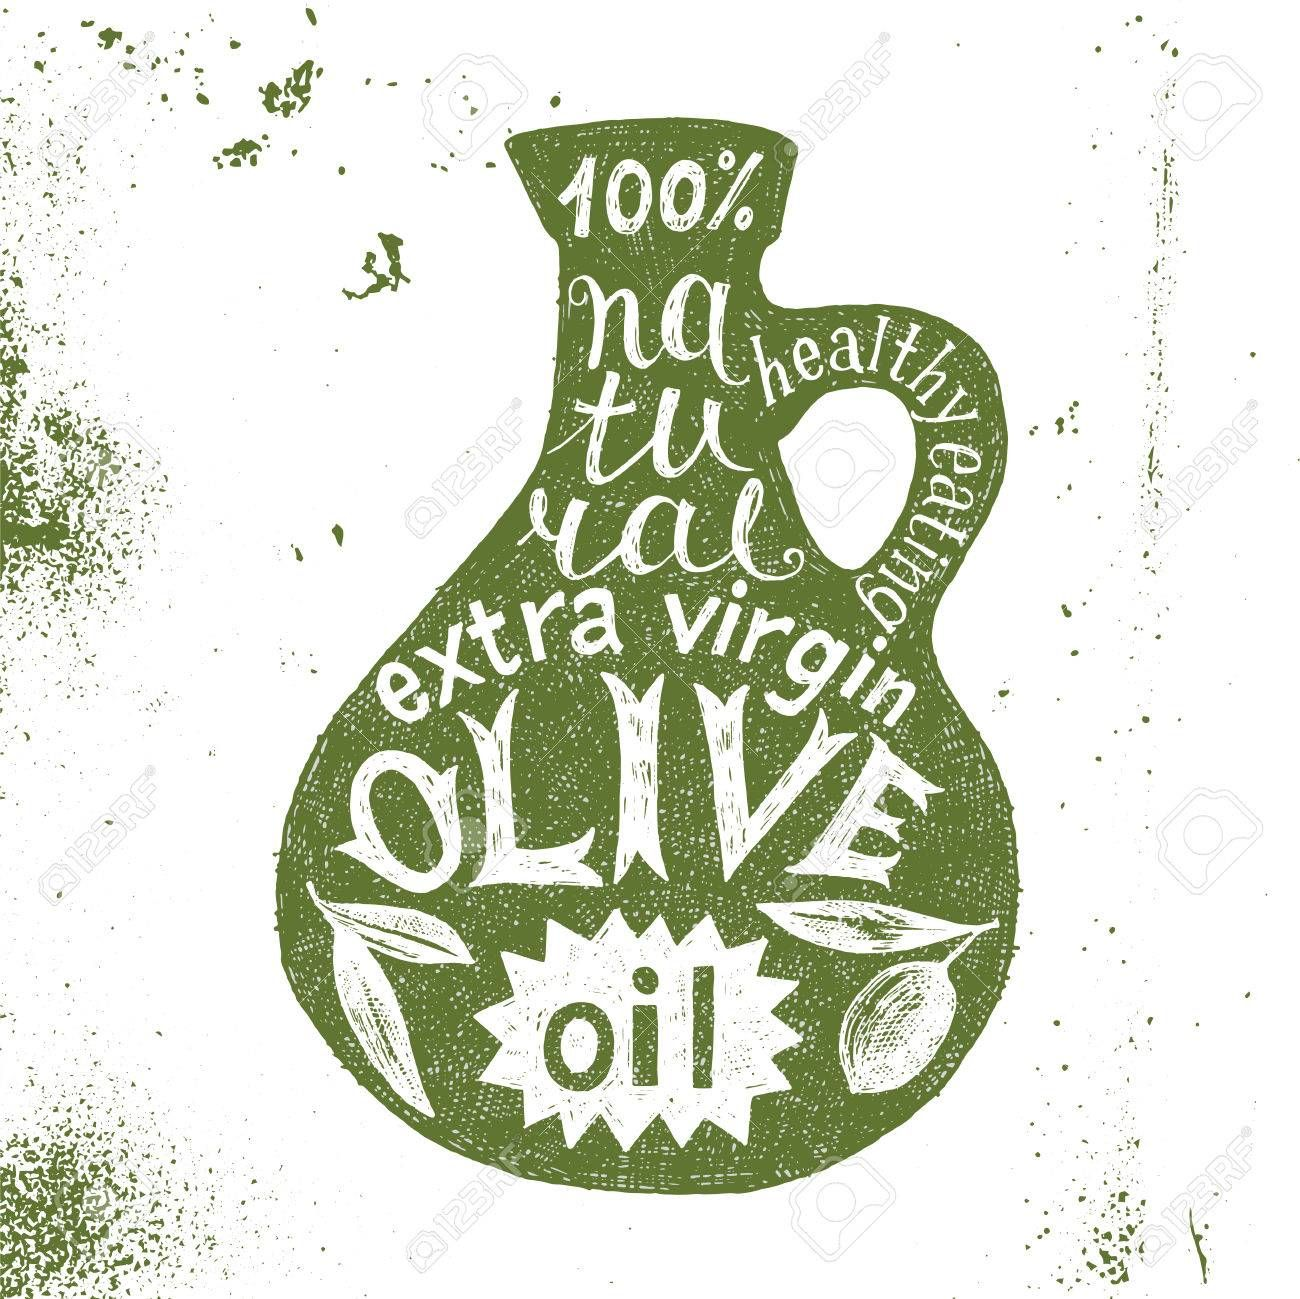 Dibujado A Mano Silueta De La Botella De Aceite De Oliva Con Diseno De Texto Botellas De Aceite De Oliva Botella De Aceite Aceite De Oliva